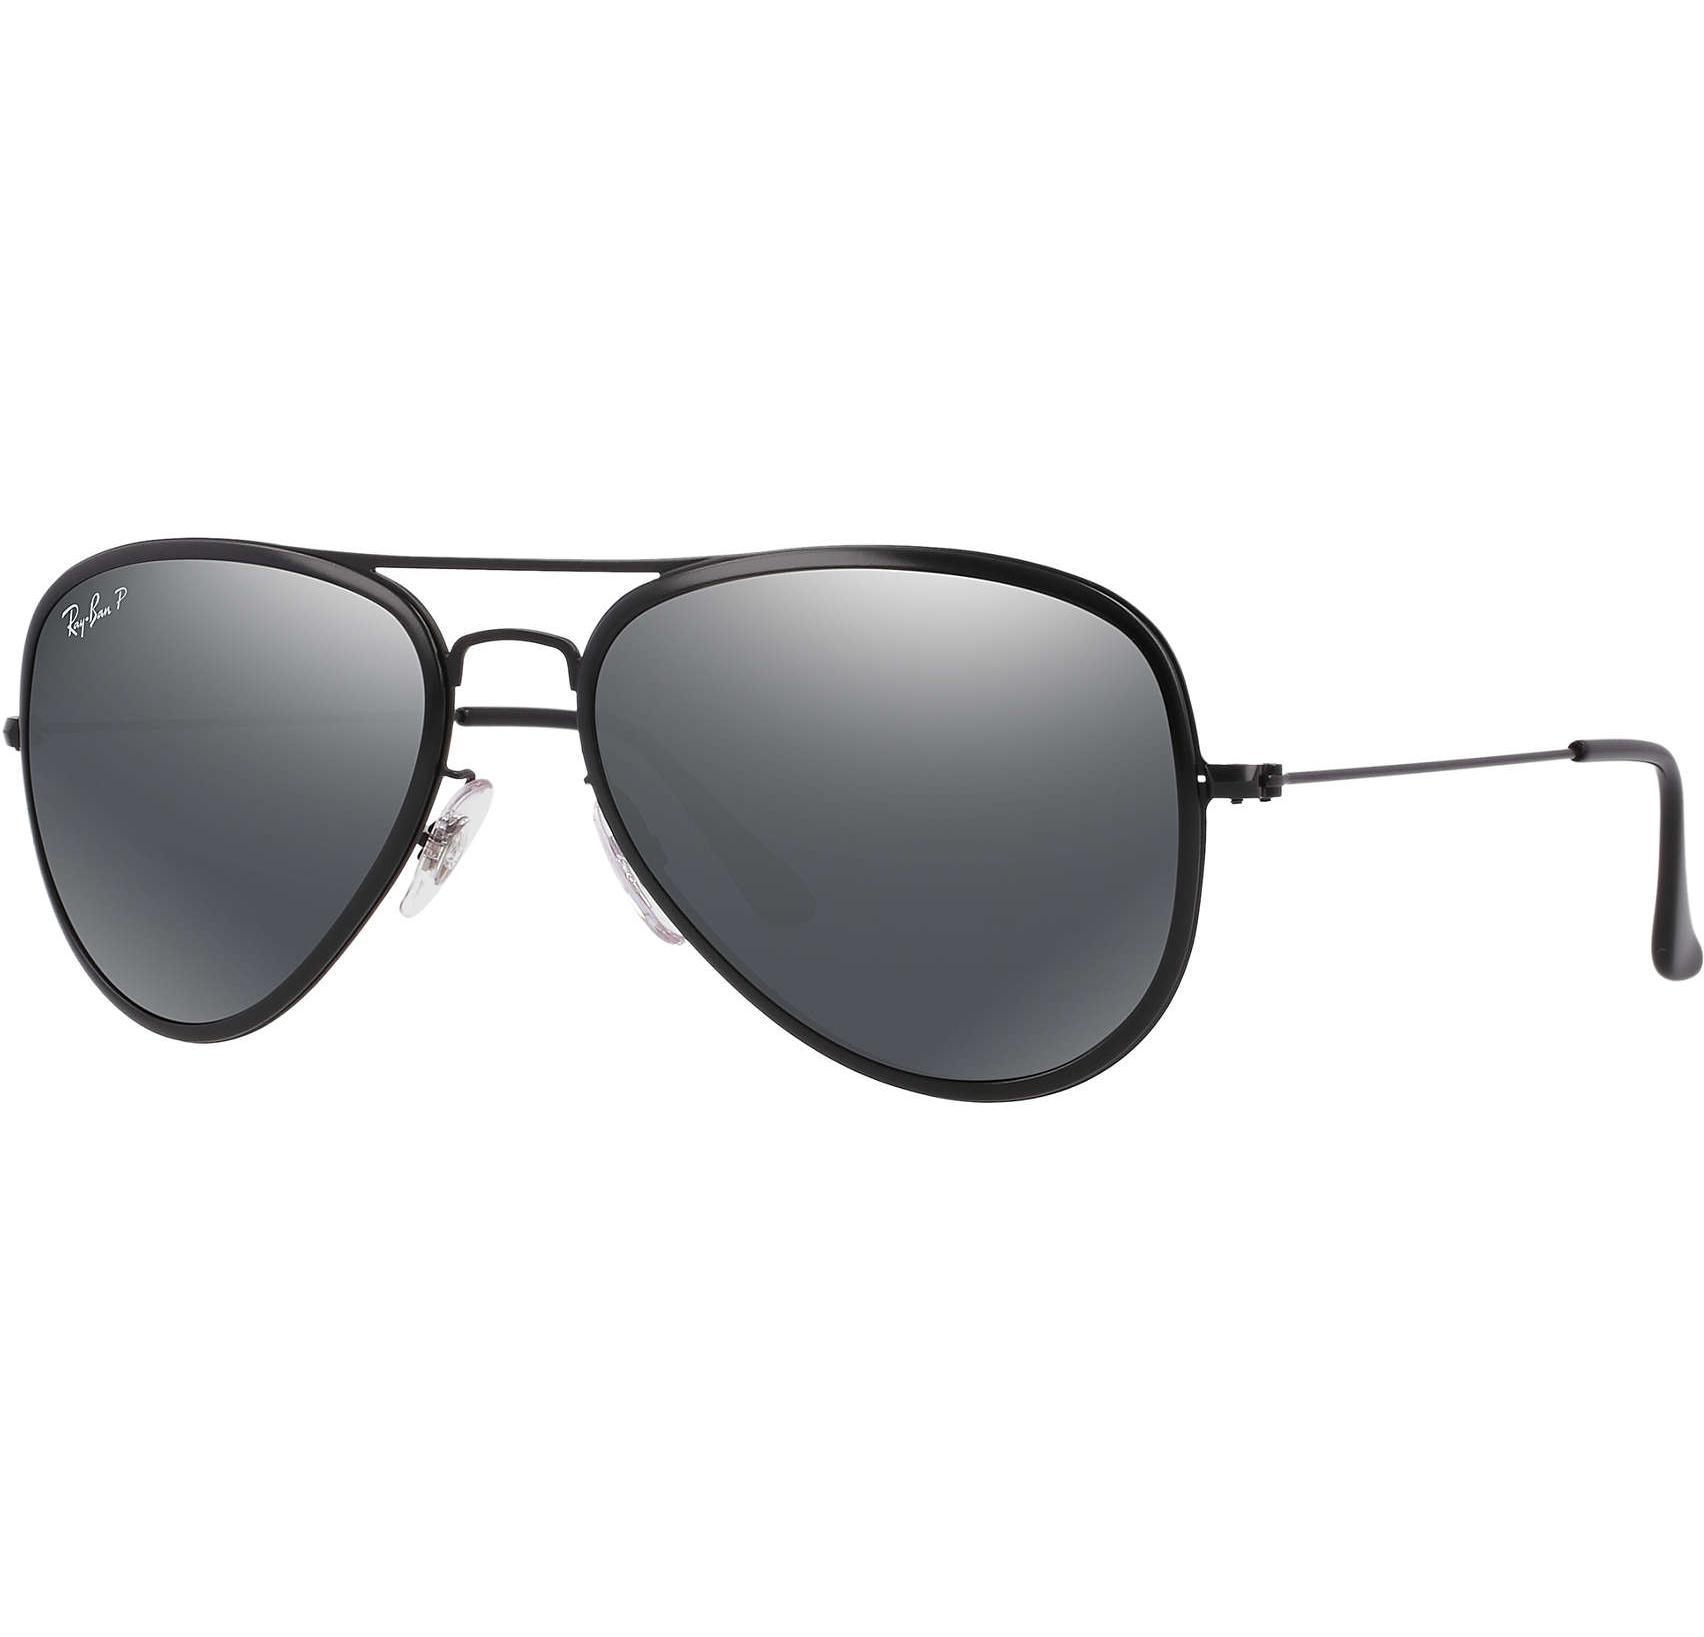 2cb508200c0 Buy Ray-ban Aviator Flat Polarized Black silver Mirror Lens in Dubai ...